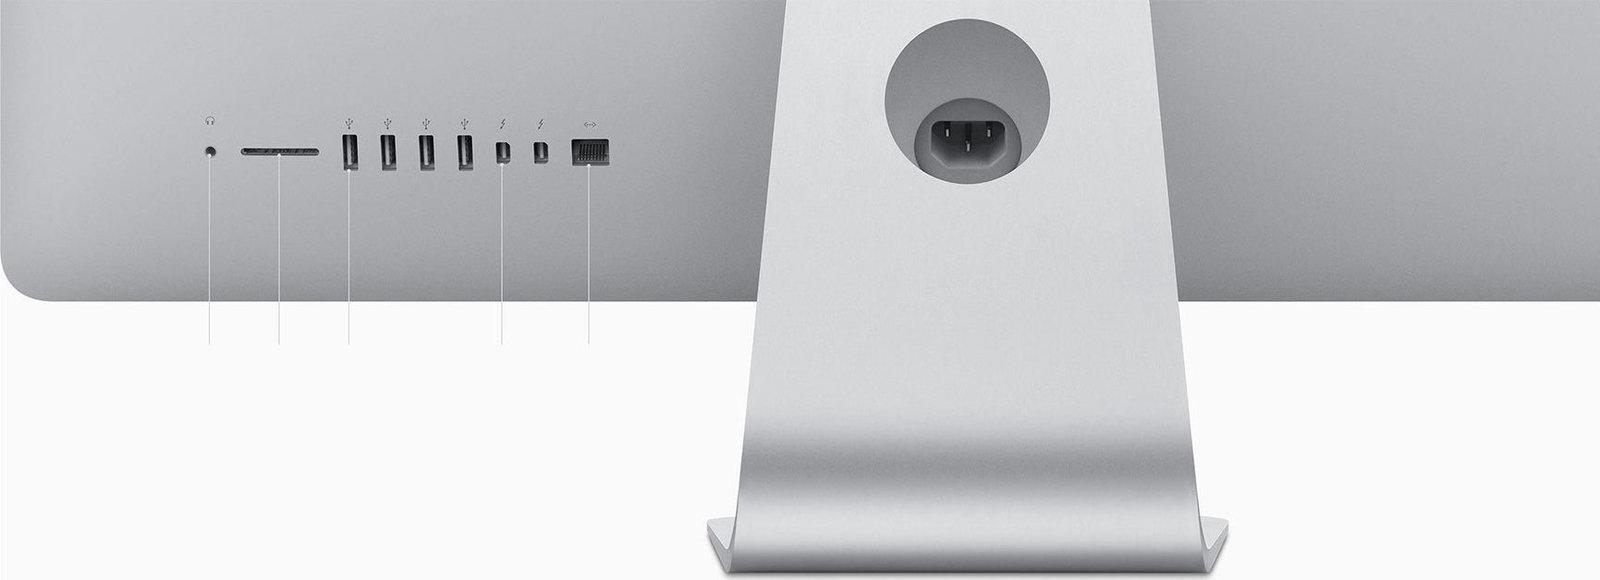 Apple iMac MK142 21.5'' 1,6GHz i5/8GB/1TB EU